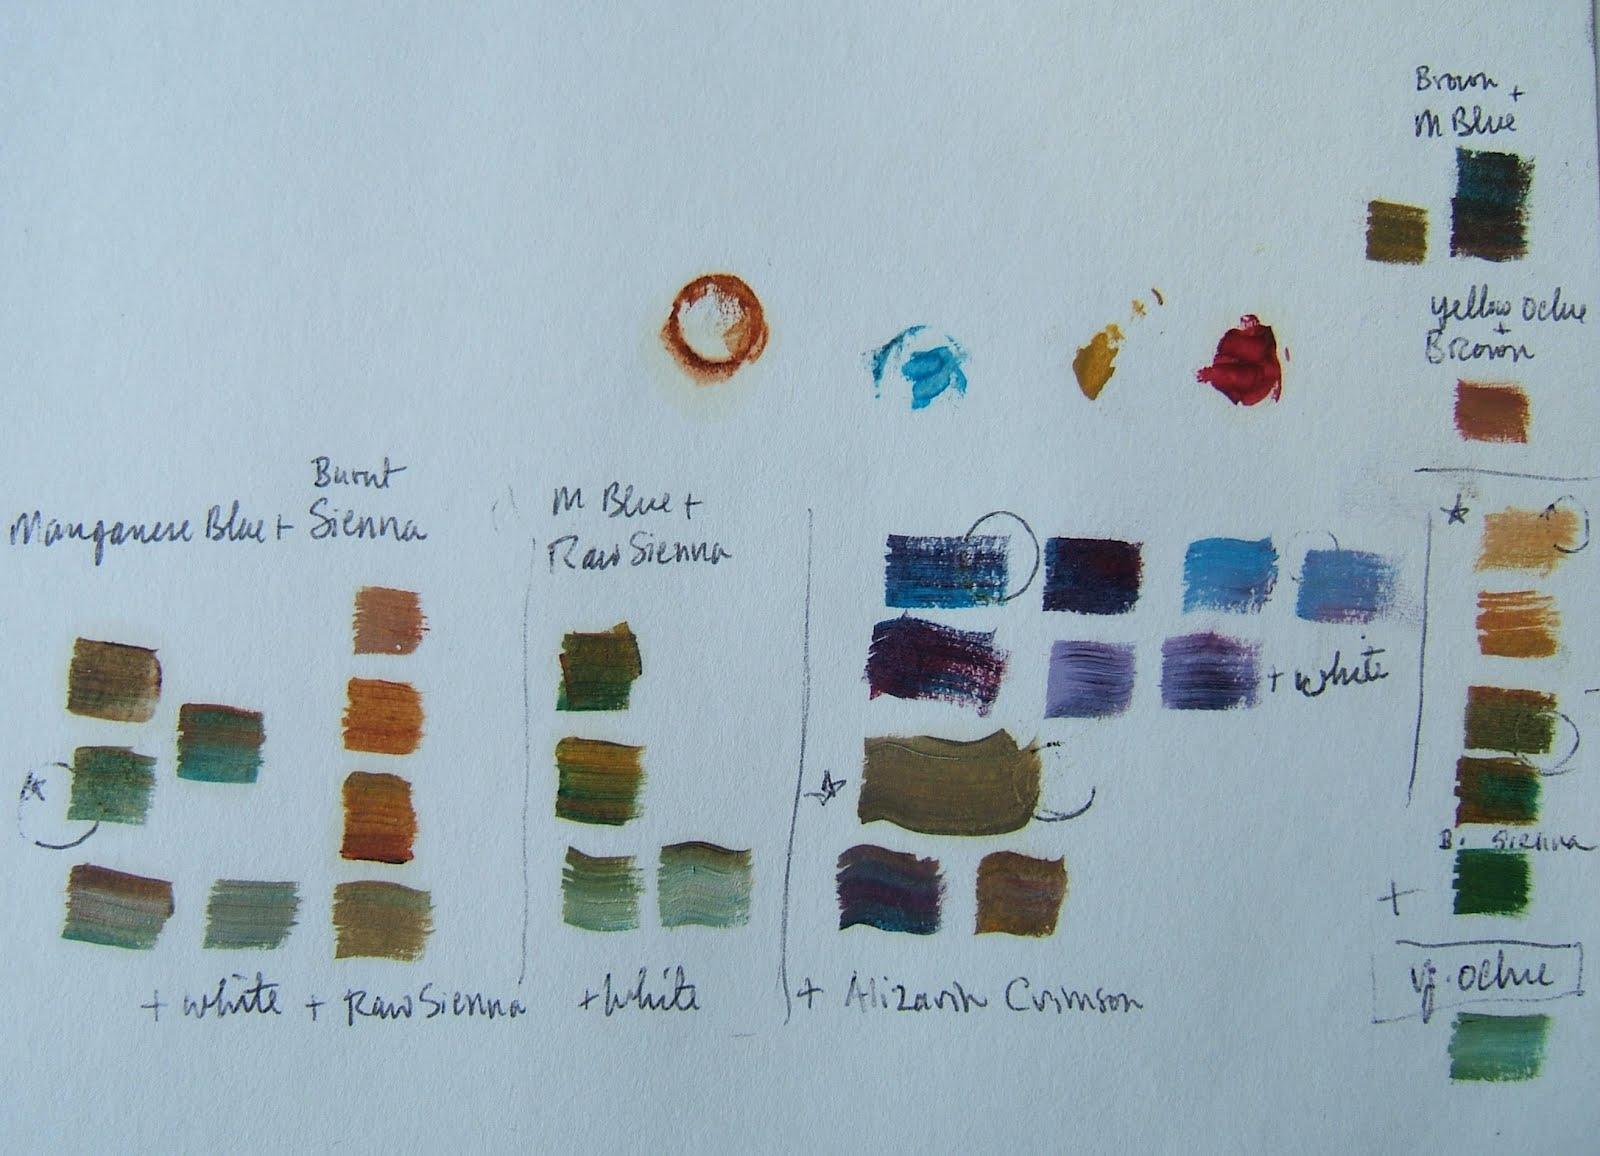 Manganese blue, Burnt Sienna, Yellow Ochre & Alizarin Crimson